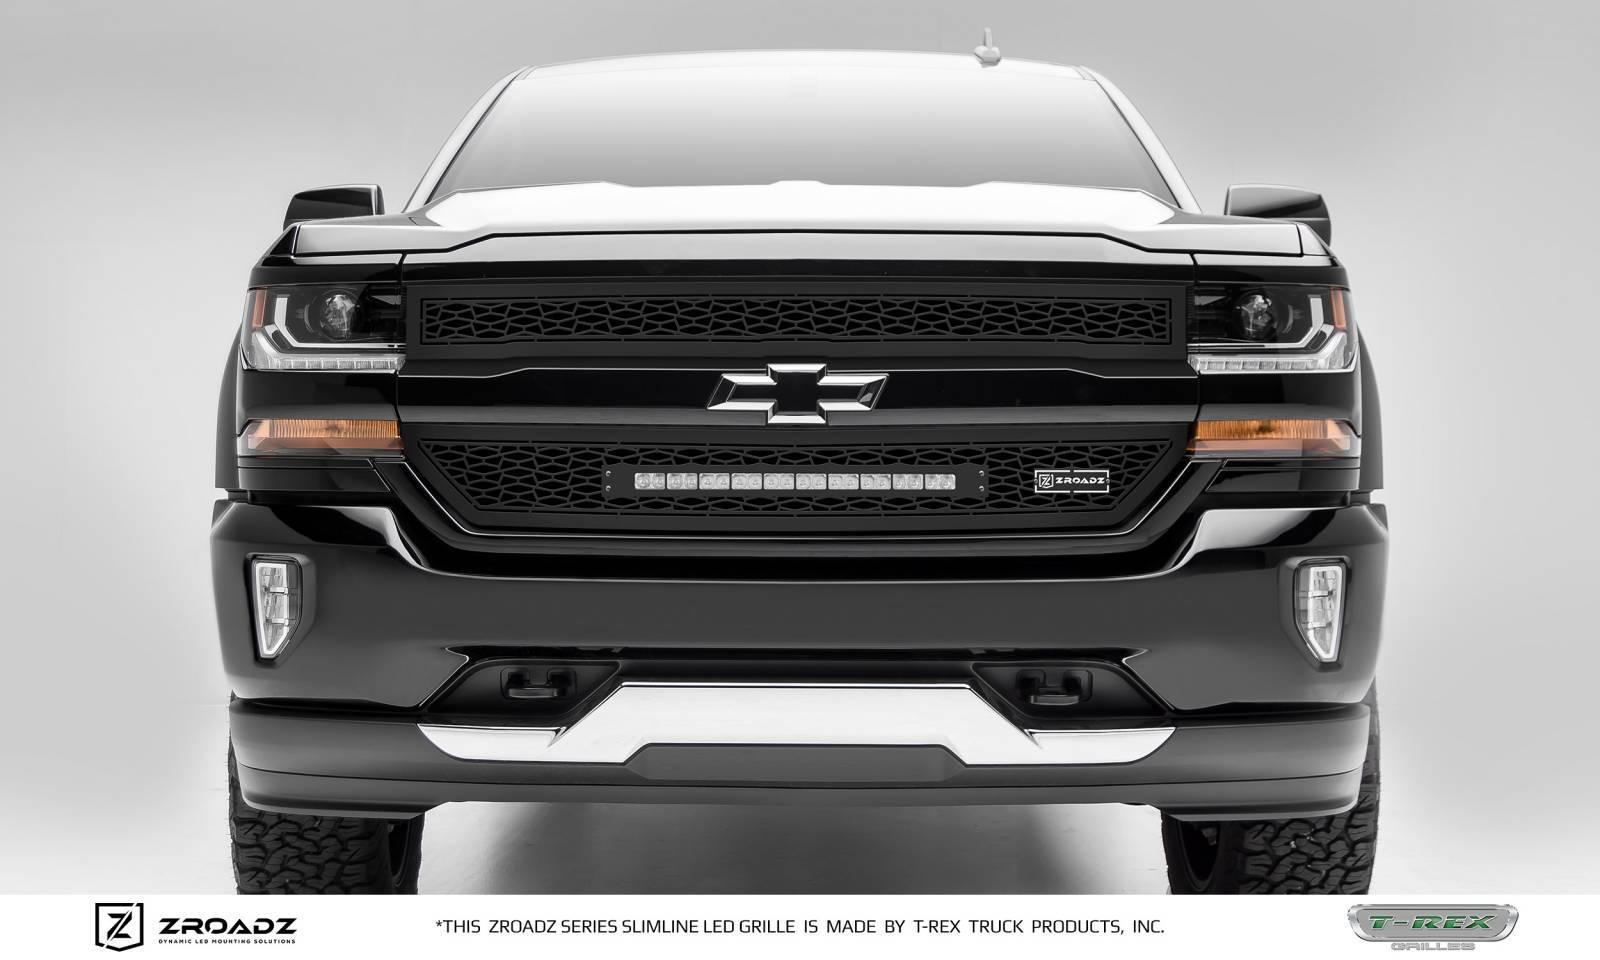 2016 2018 Silverado 1500 Zroadz Grille Black 2 Pc Insert Incl 1 20 Led Pn Z311281